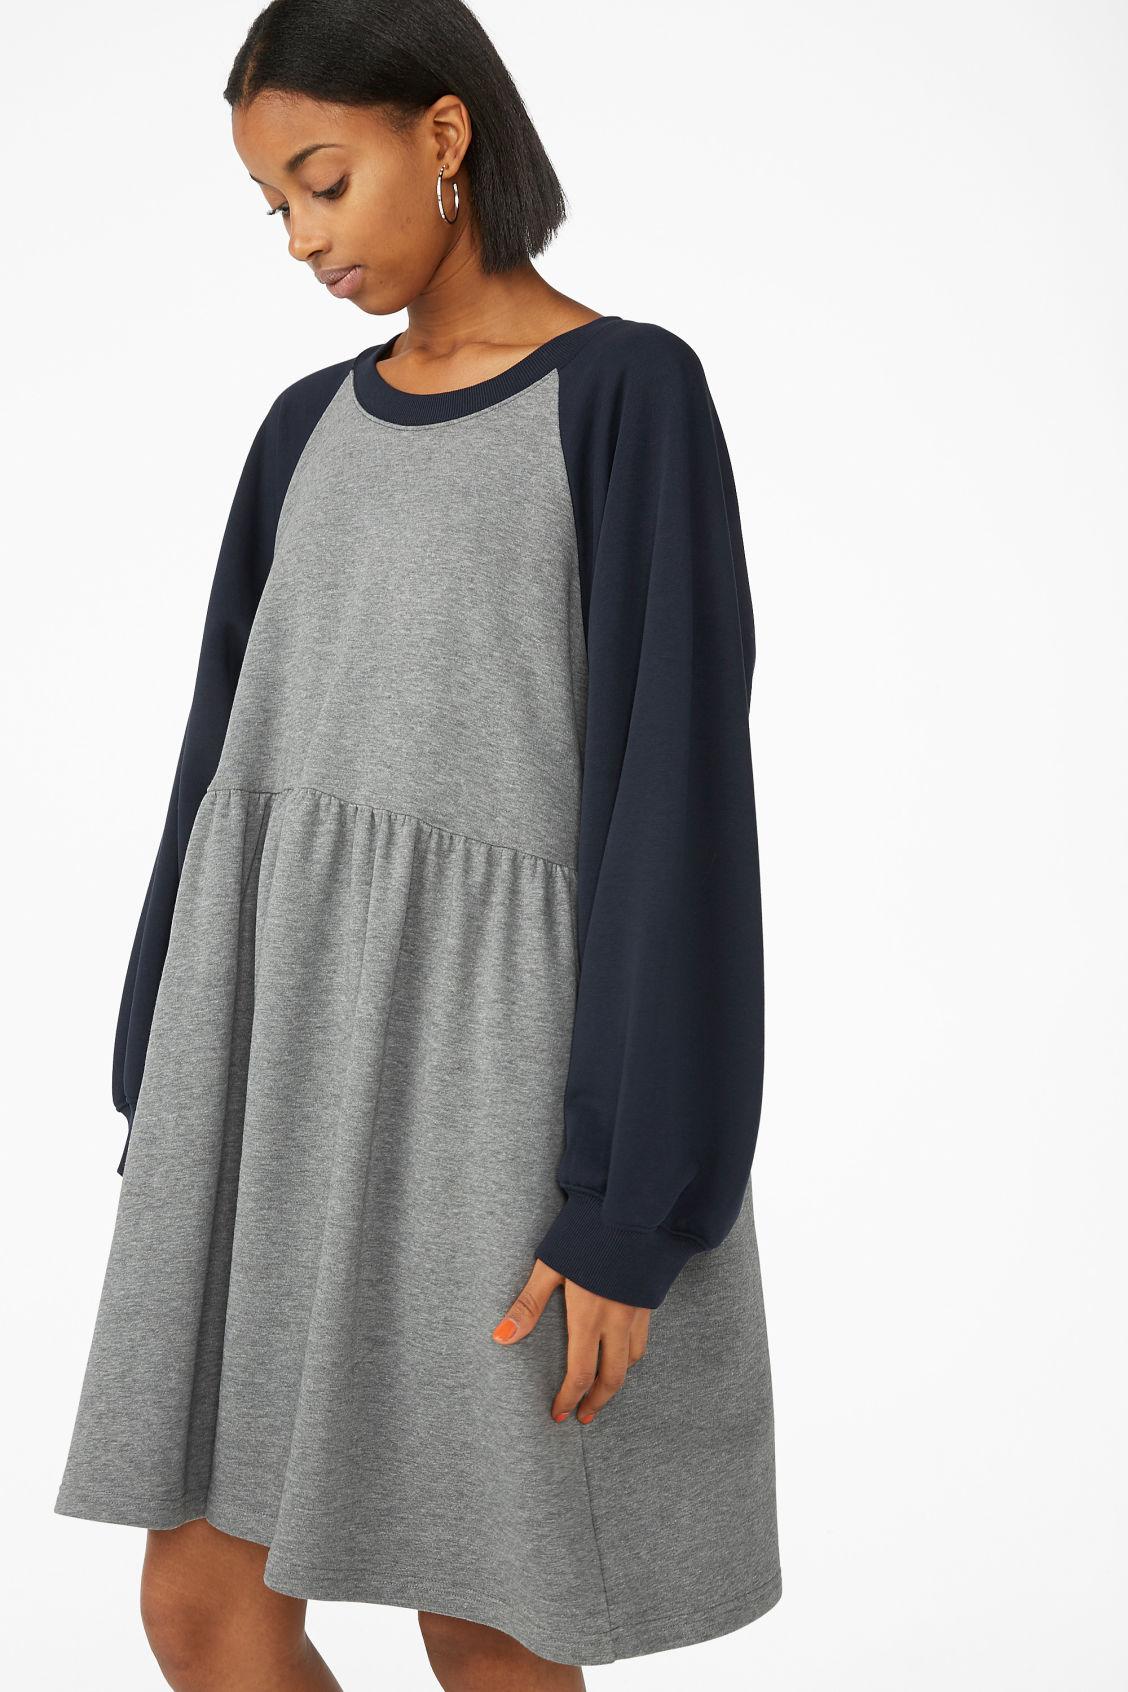 Melange Grey Sweatshirt Dress Dresses Monki 7gyvmb6IYf